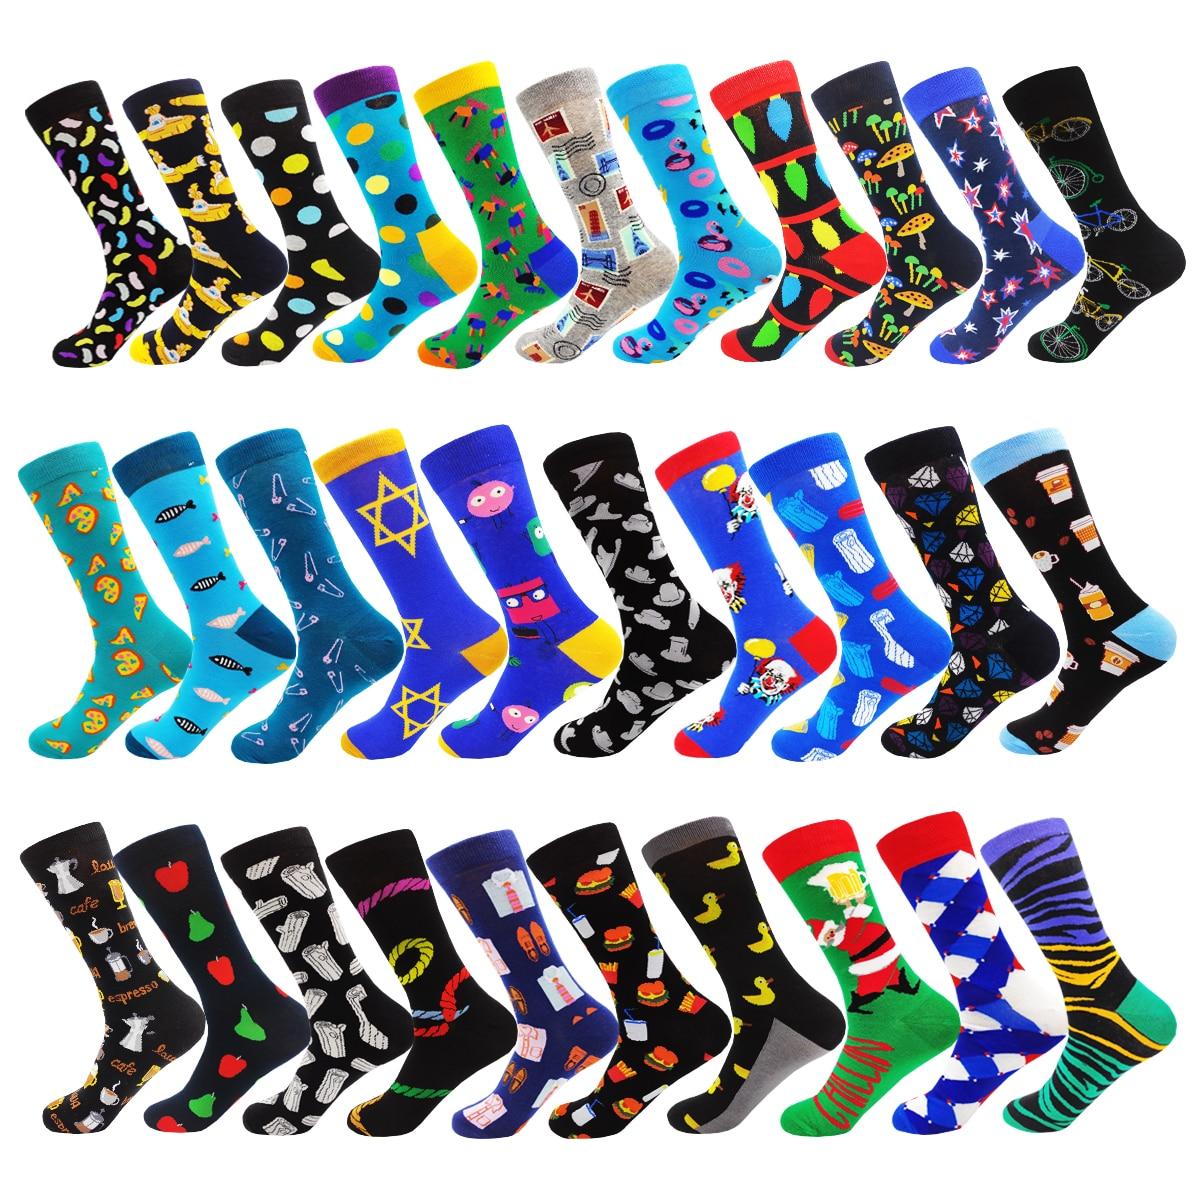 Fashion Hip Hop Colorful Novelty Cotton Mens And Women Socks Cartoon Hamburger Mushroom Cookie Kawaii Happy Funny Dress Socks